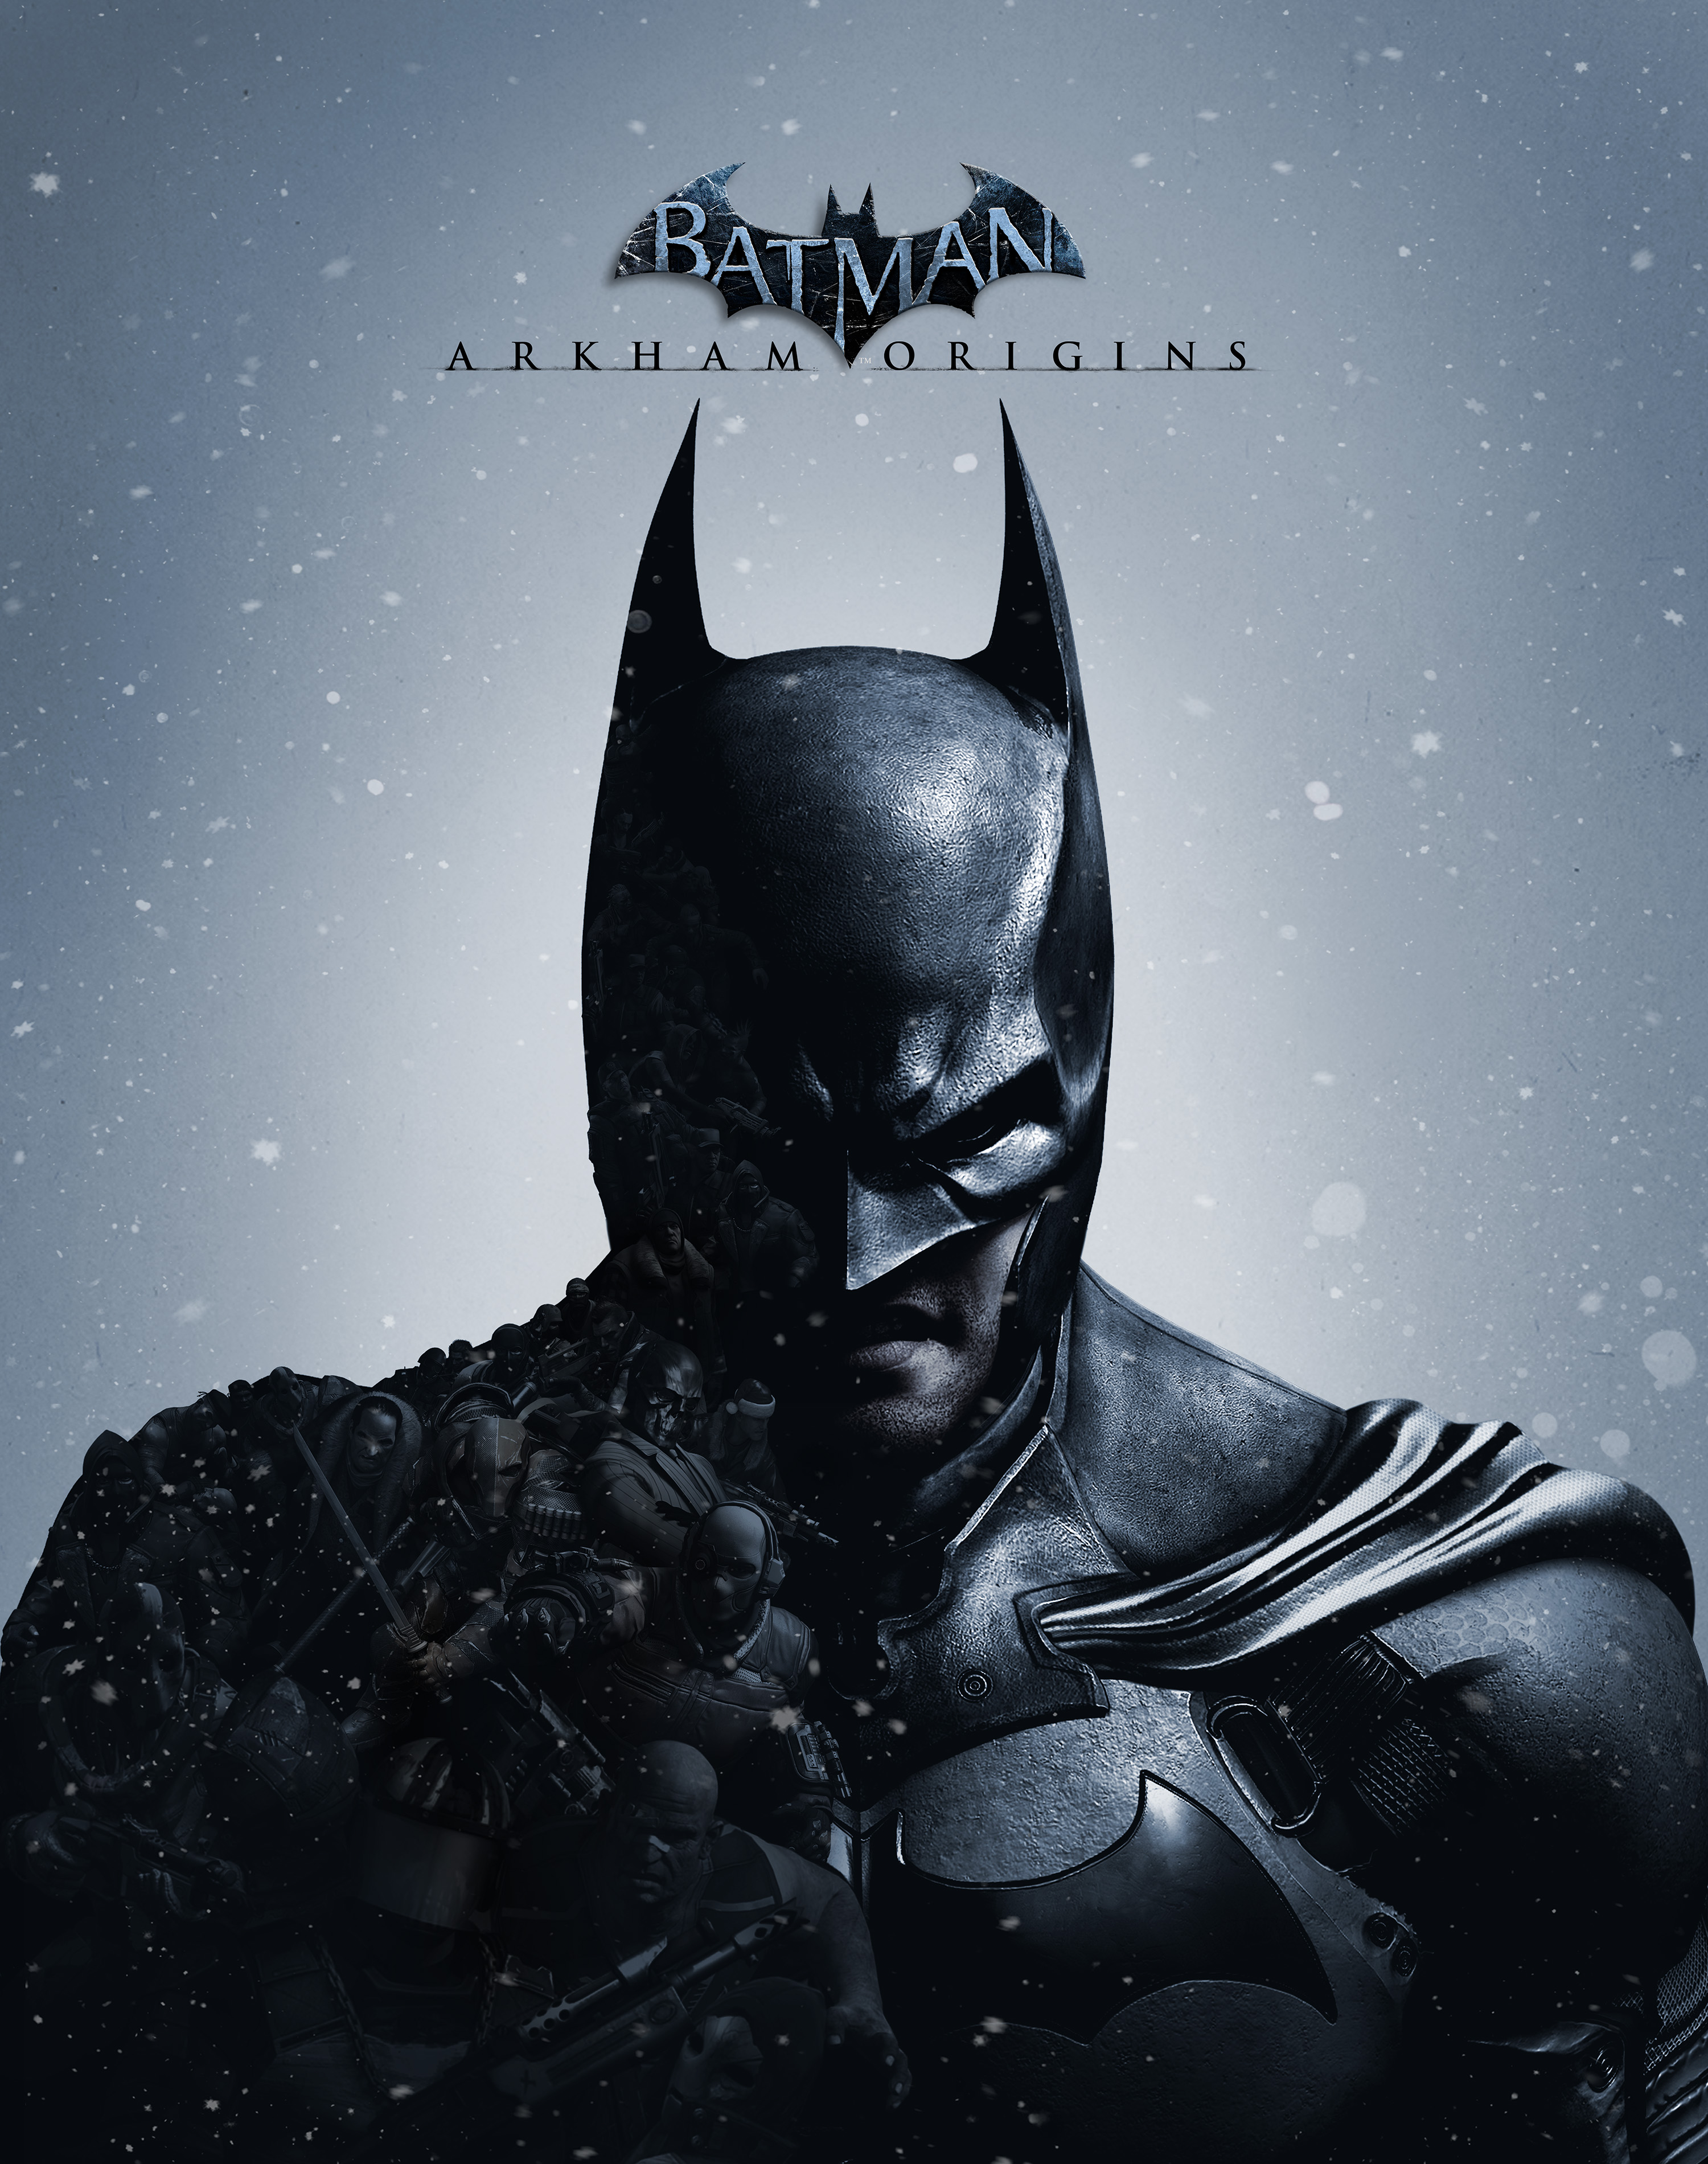 Batman: Arkham Origins [UPD8] (2013/RUS/ENG) RePack by tg